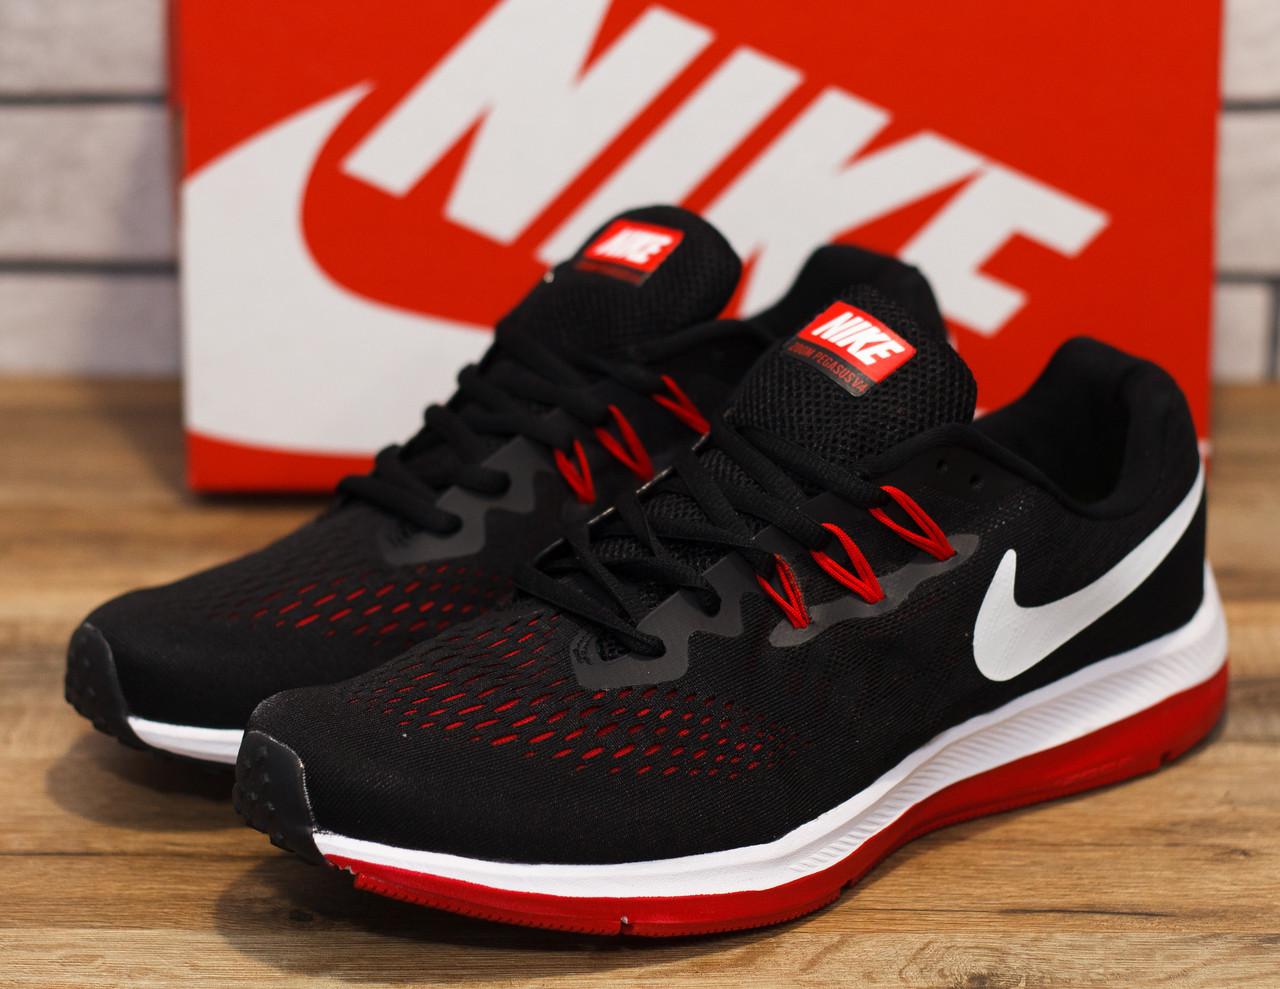 Кроссовки Мужские Nike Zoom Pegasus V4 (реплика) 10737 — в Категории